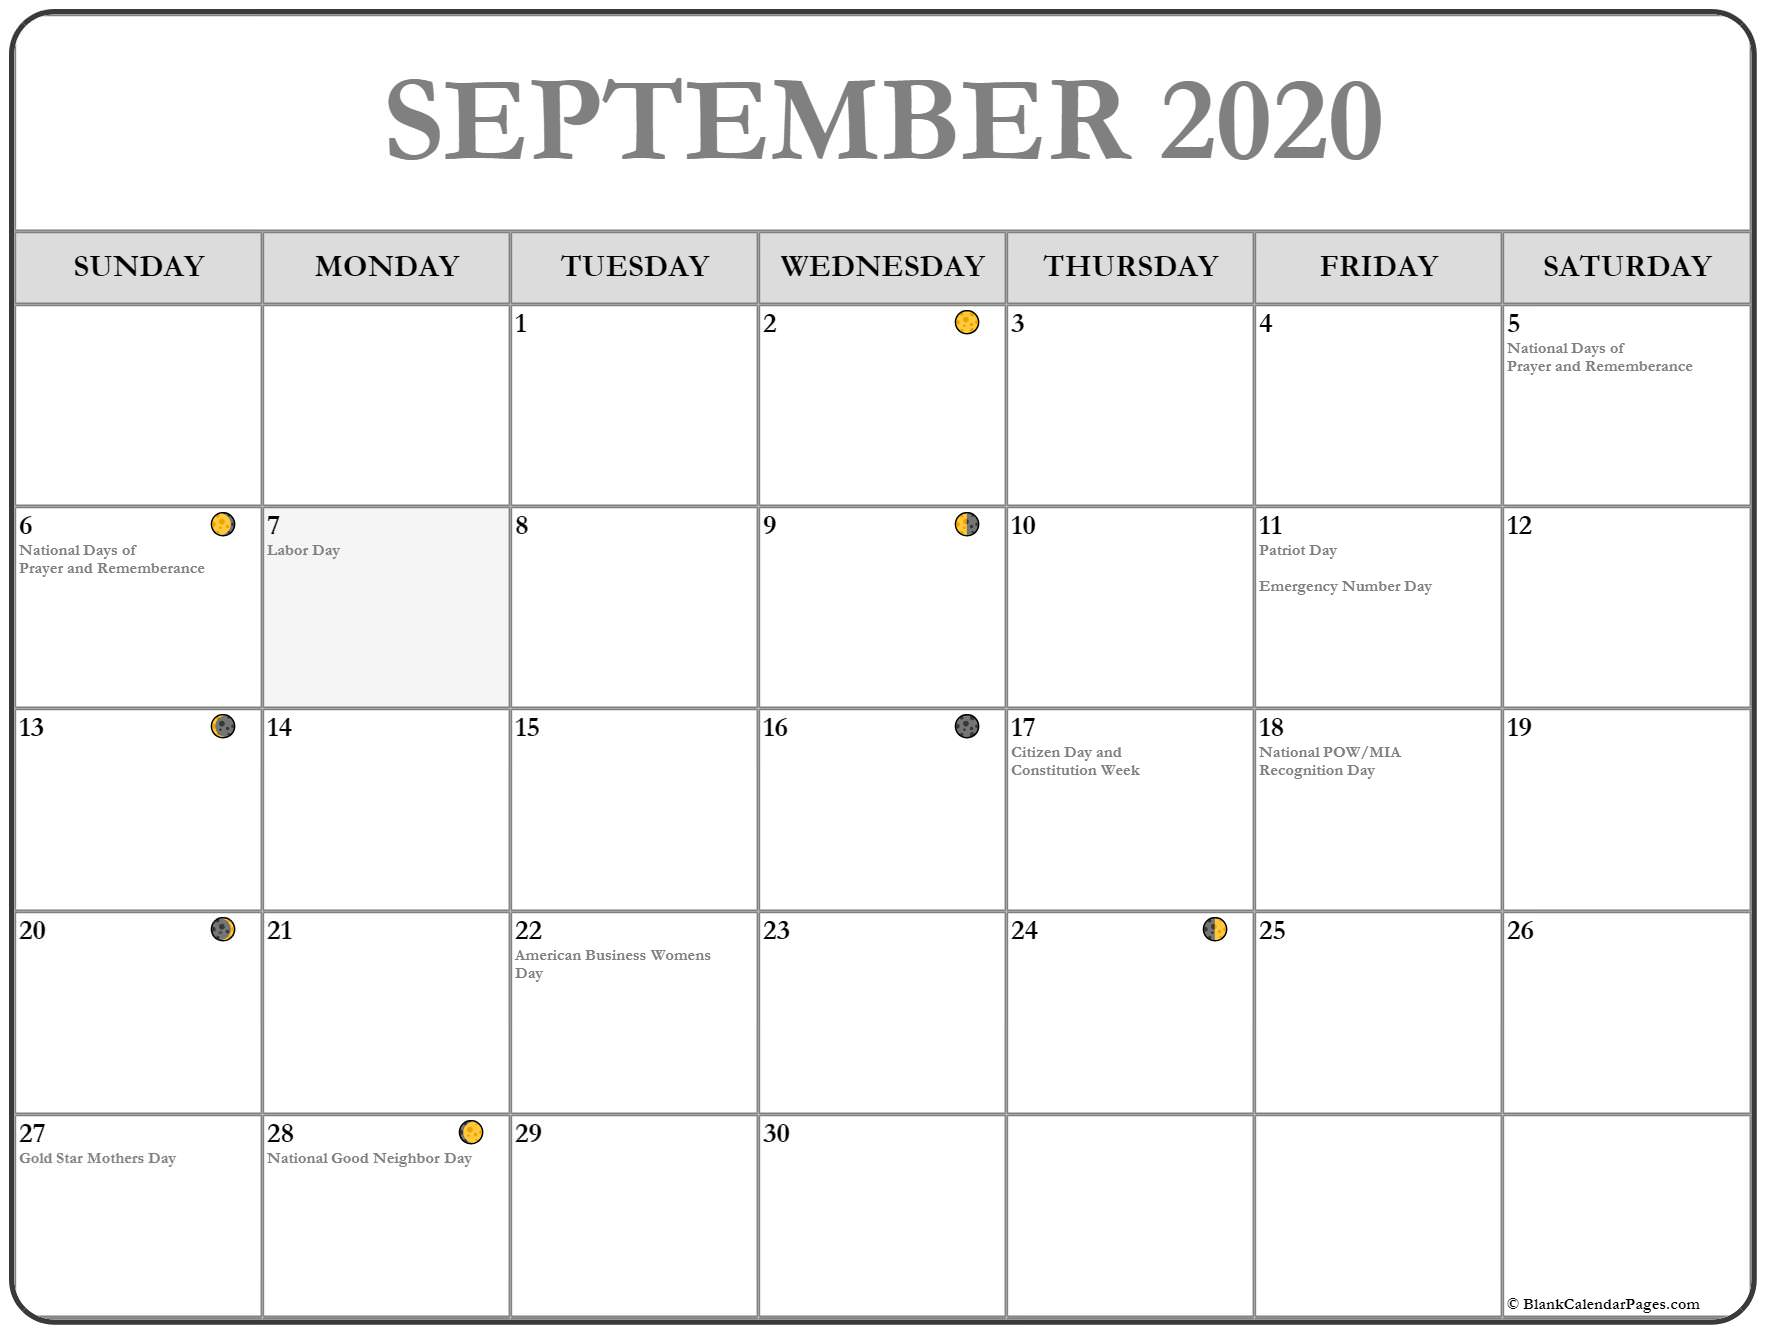 September 2020 Moon Calendar with Holidays